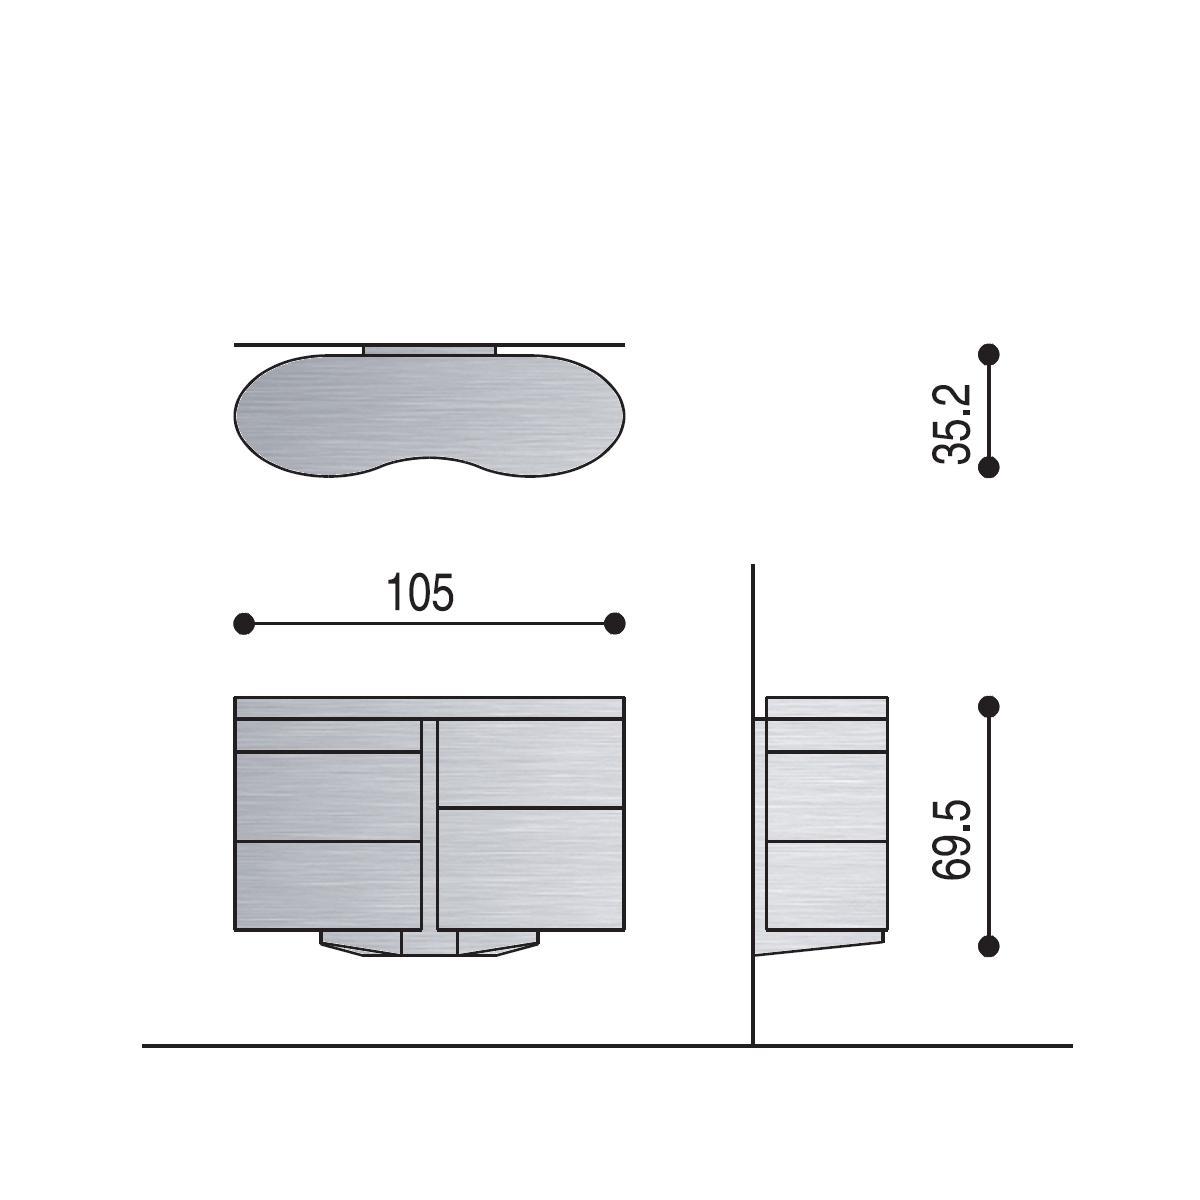 BITTE TWINS Wandkonsole, technische Details